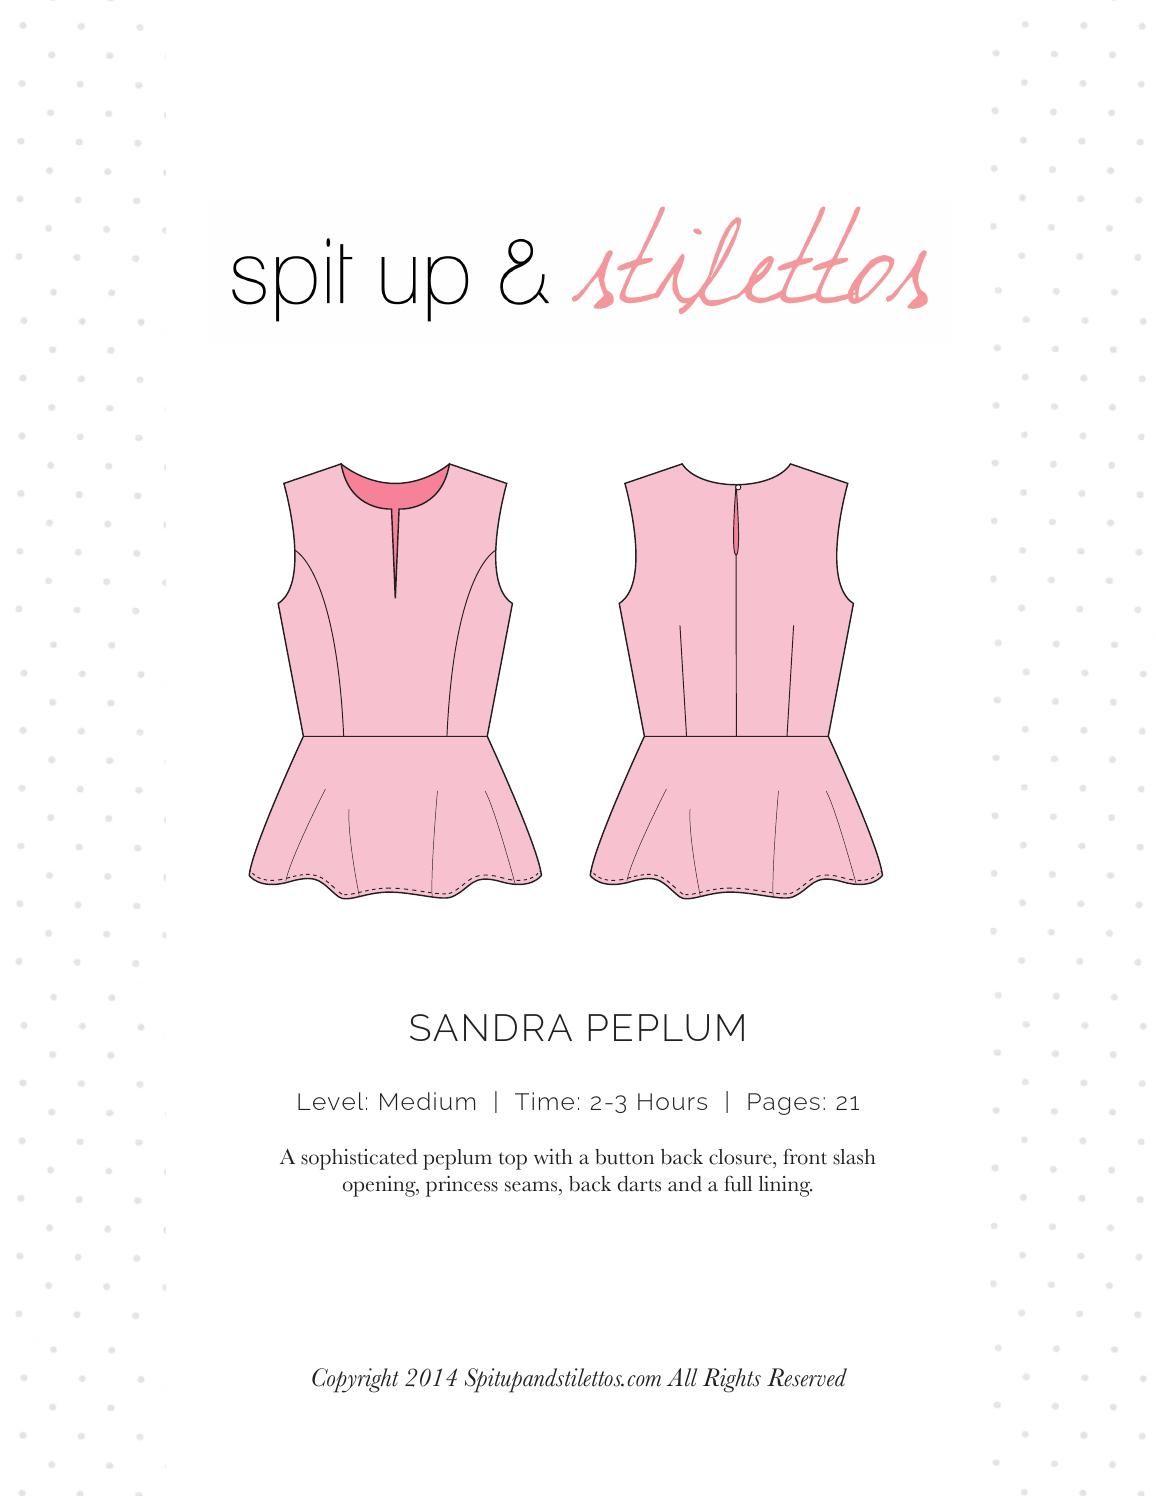 Sandra Peplum Sewing Pattern Spit Up & Stilettos | Tuto technique ...